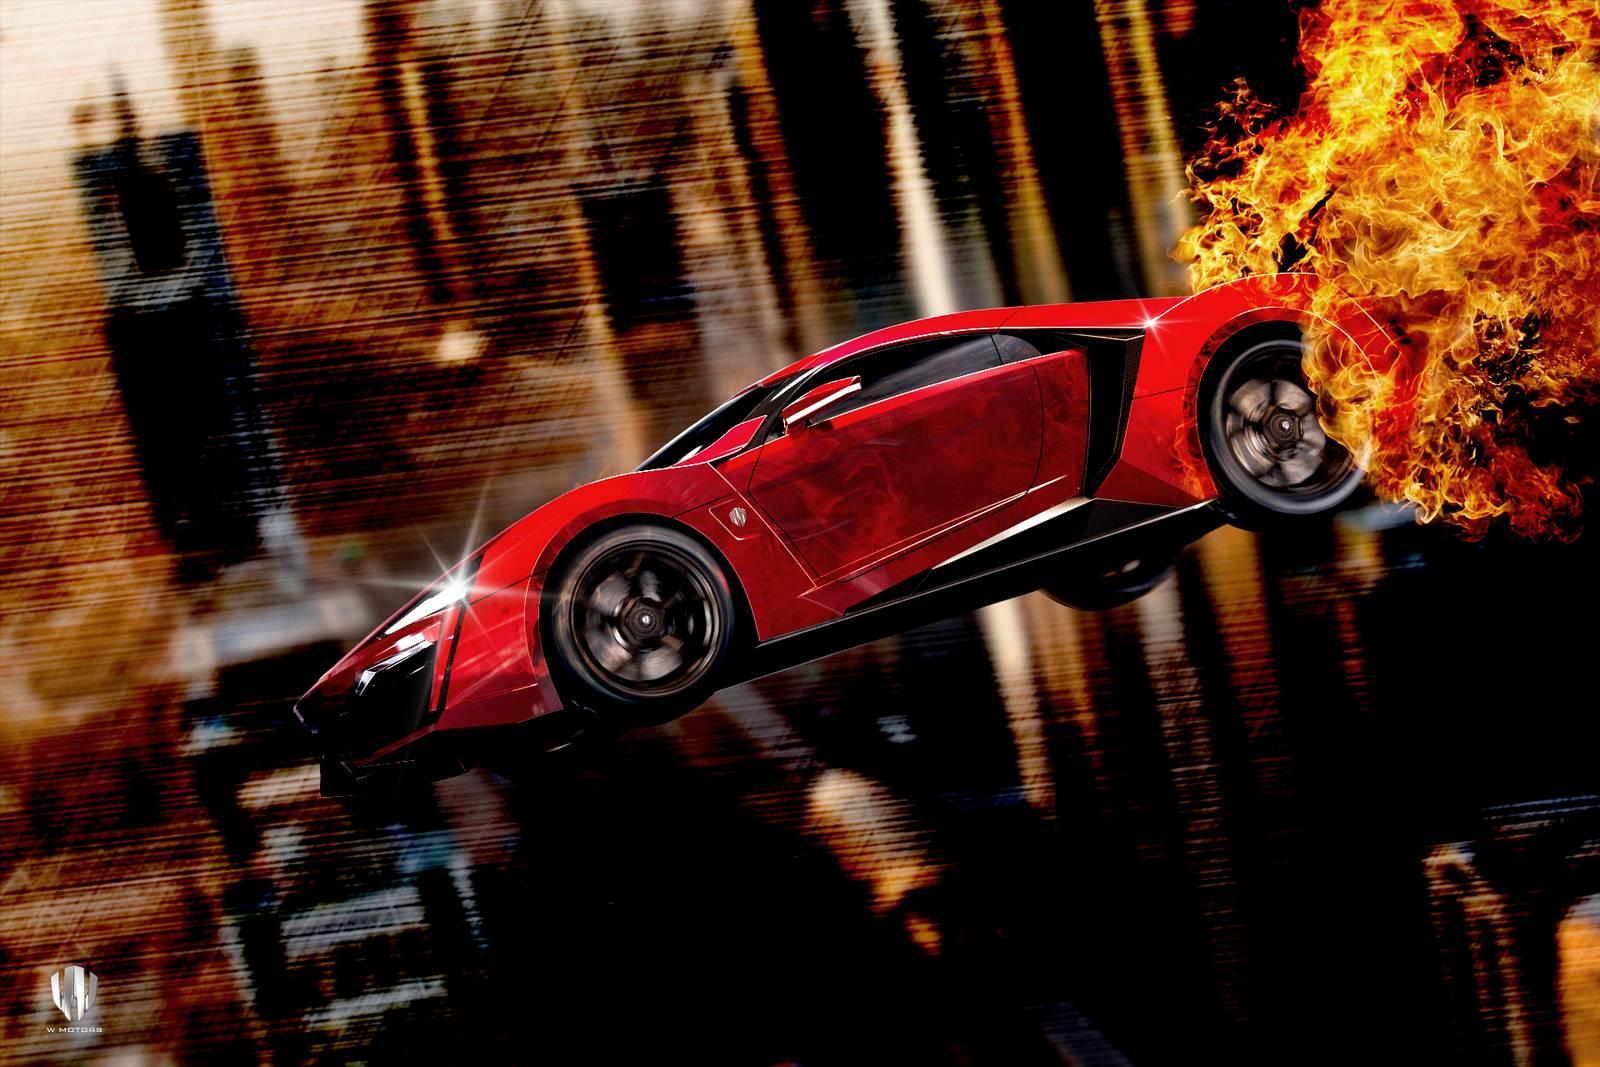 meet fast and furious 7 lykan hypersport the hero car gtspirit. Black Bedroom Furniture Sets. Home Design Ideas